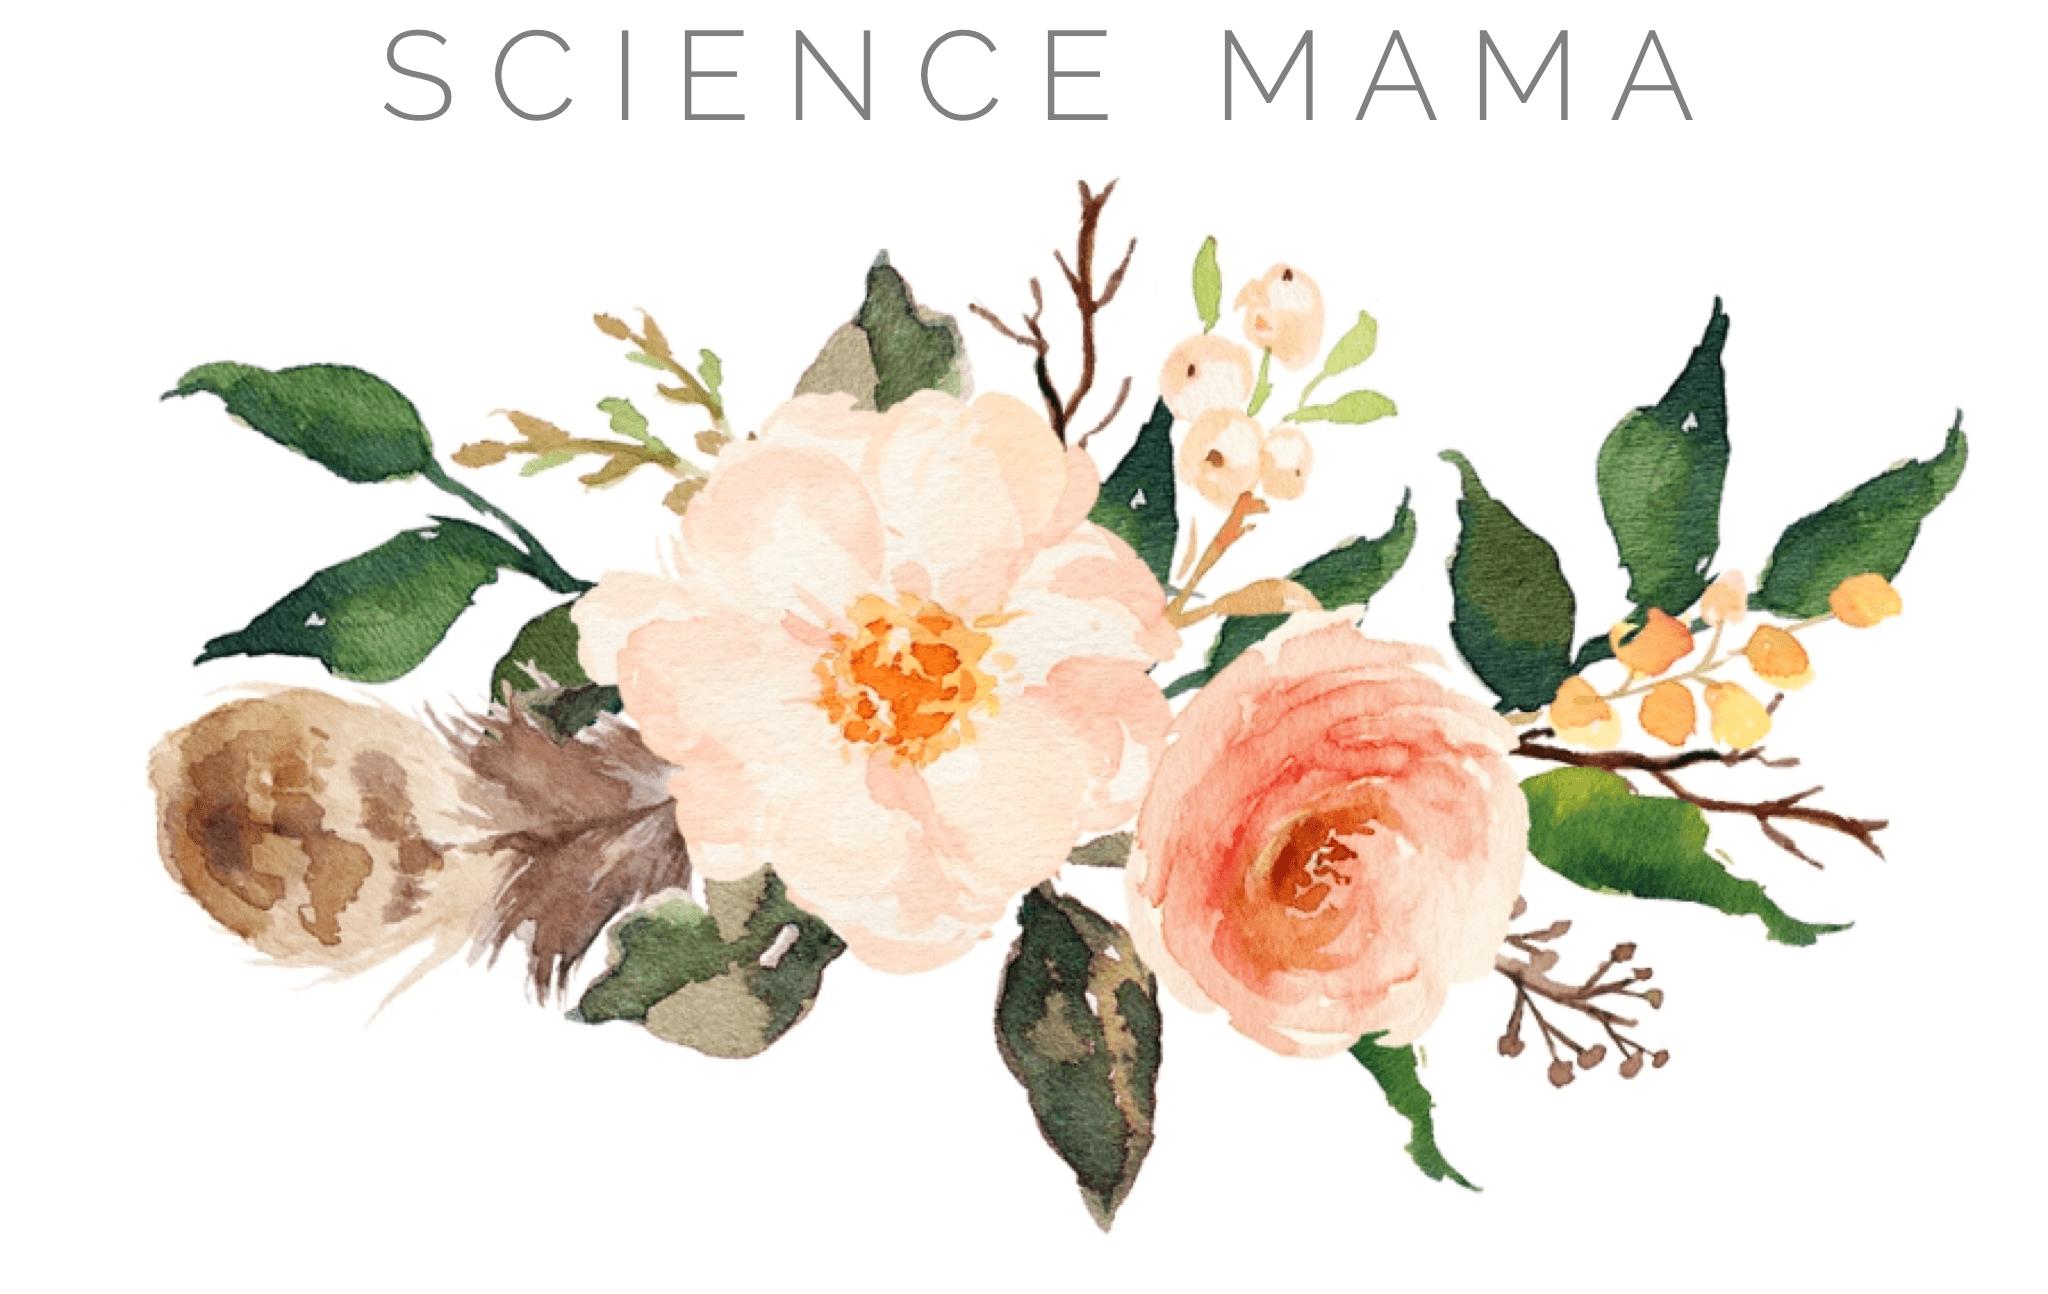 Science Mama